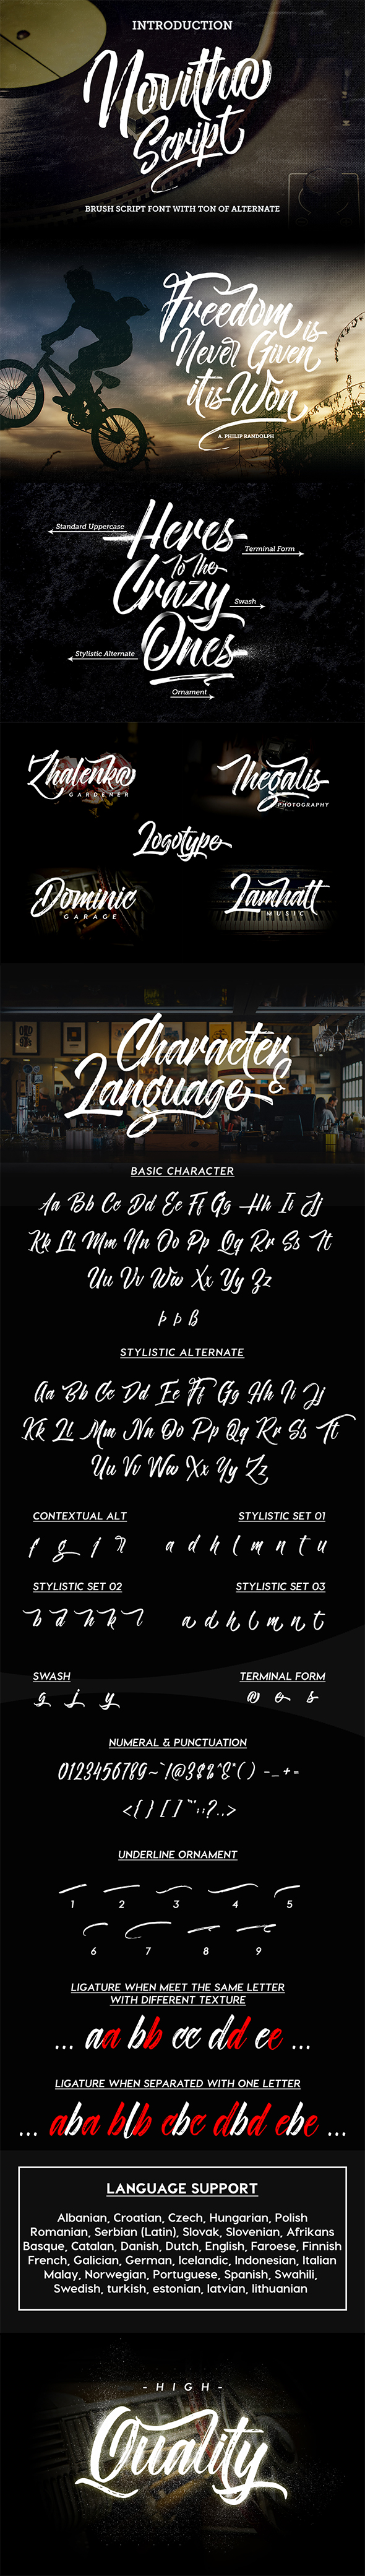 Novitha Script - Hand-writing Script